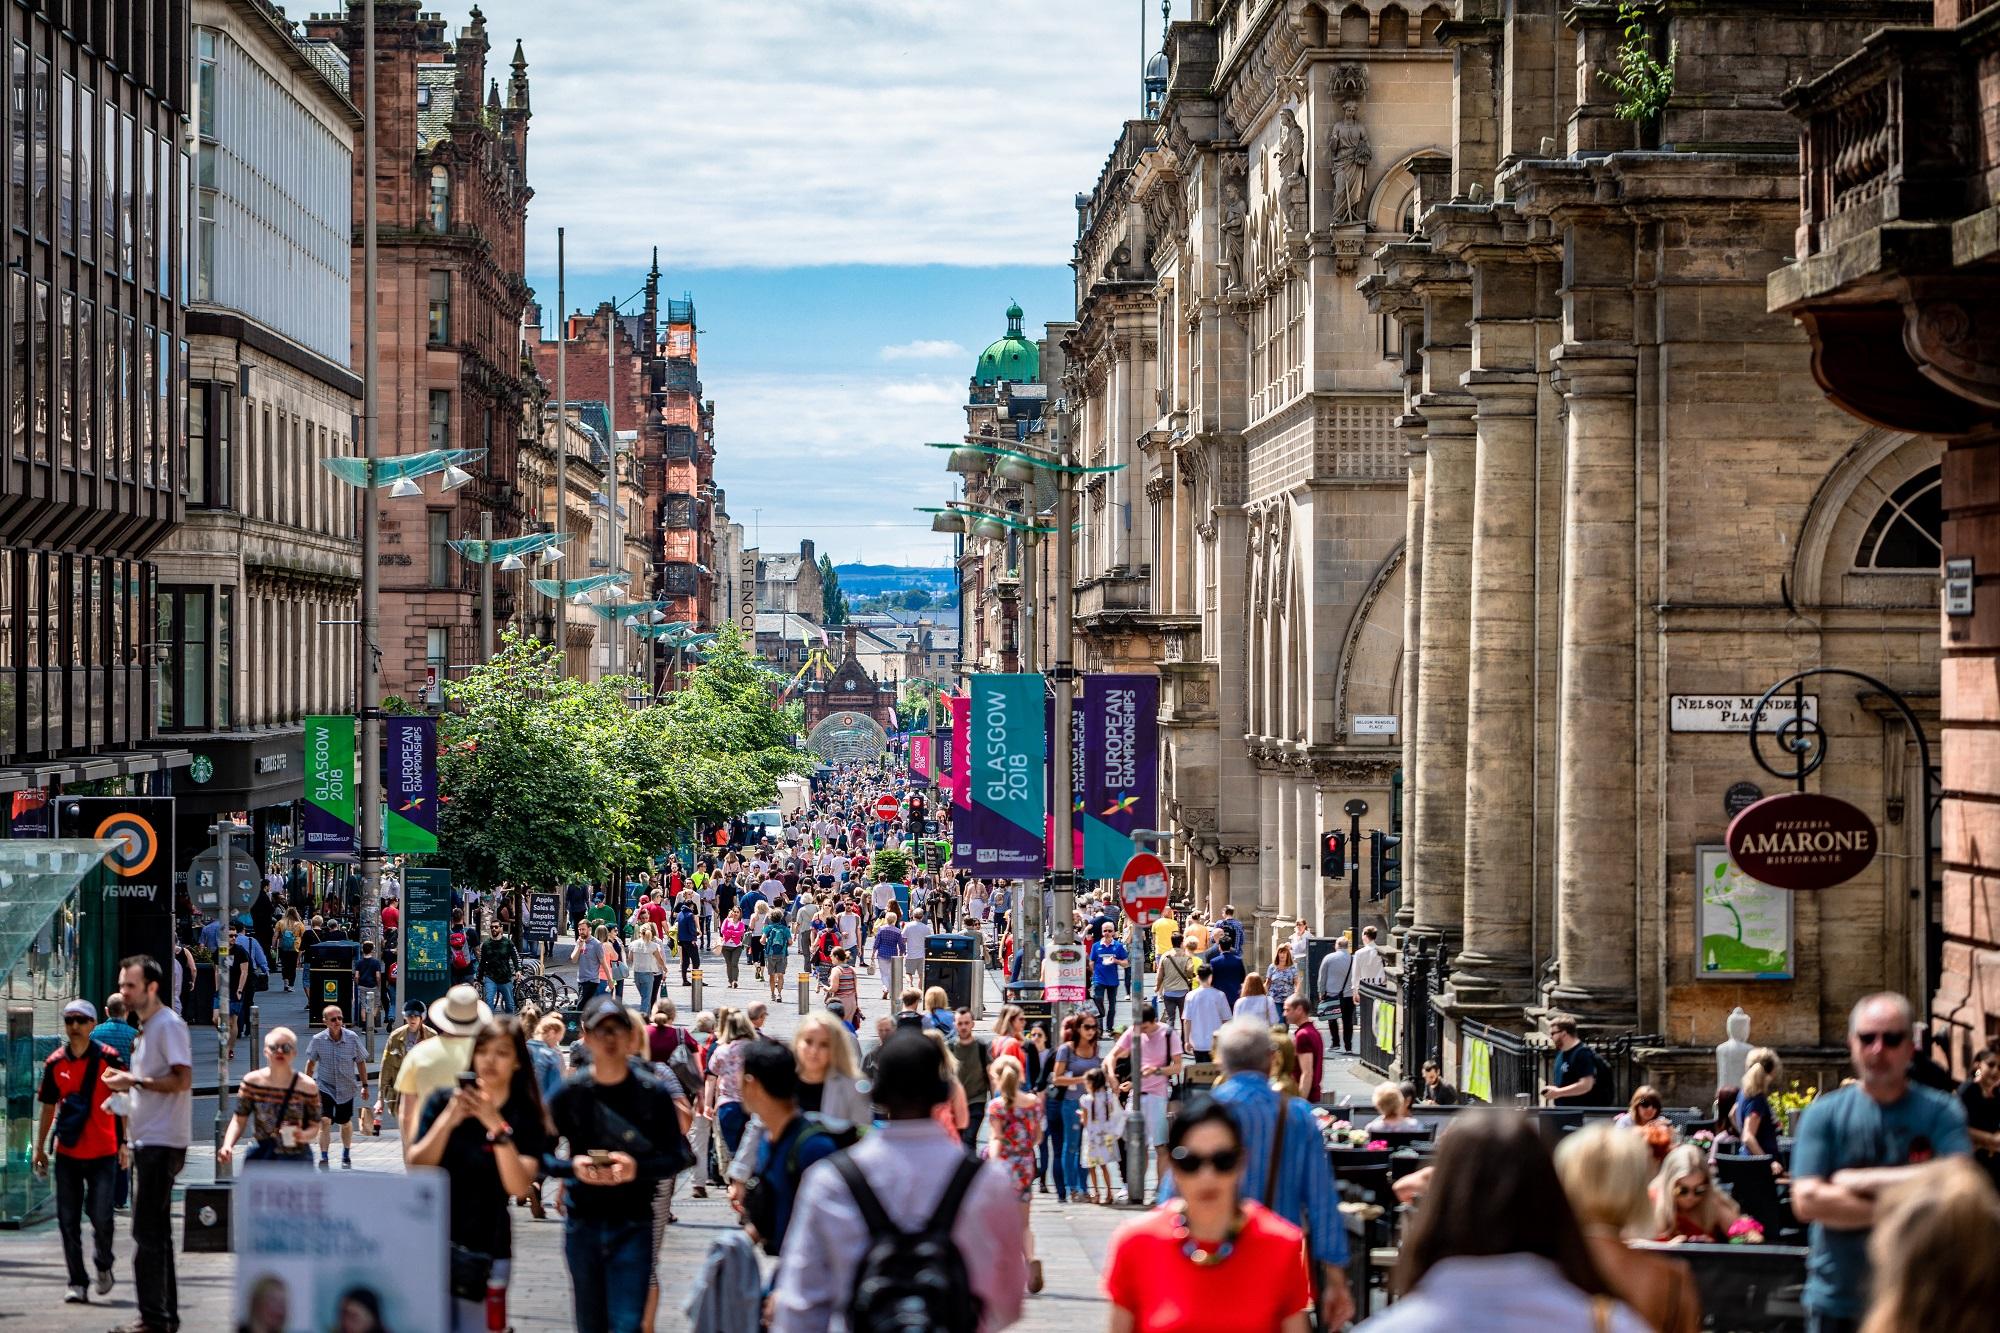 Retailers on the high streeta